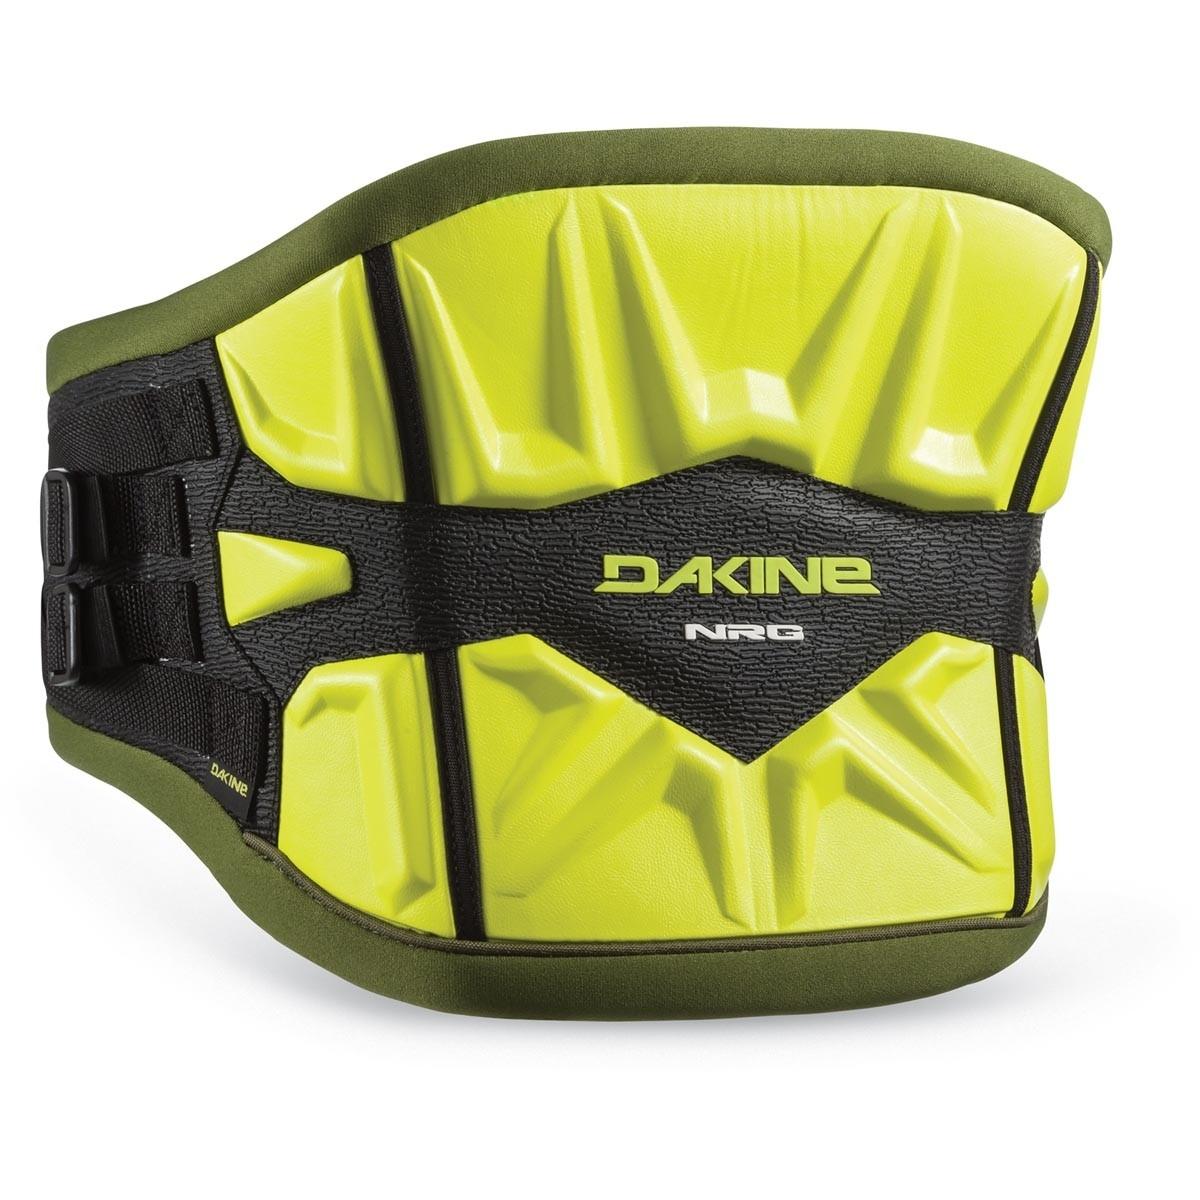 Dakine waist harness Hybrid NRG 2017